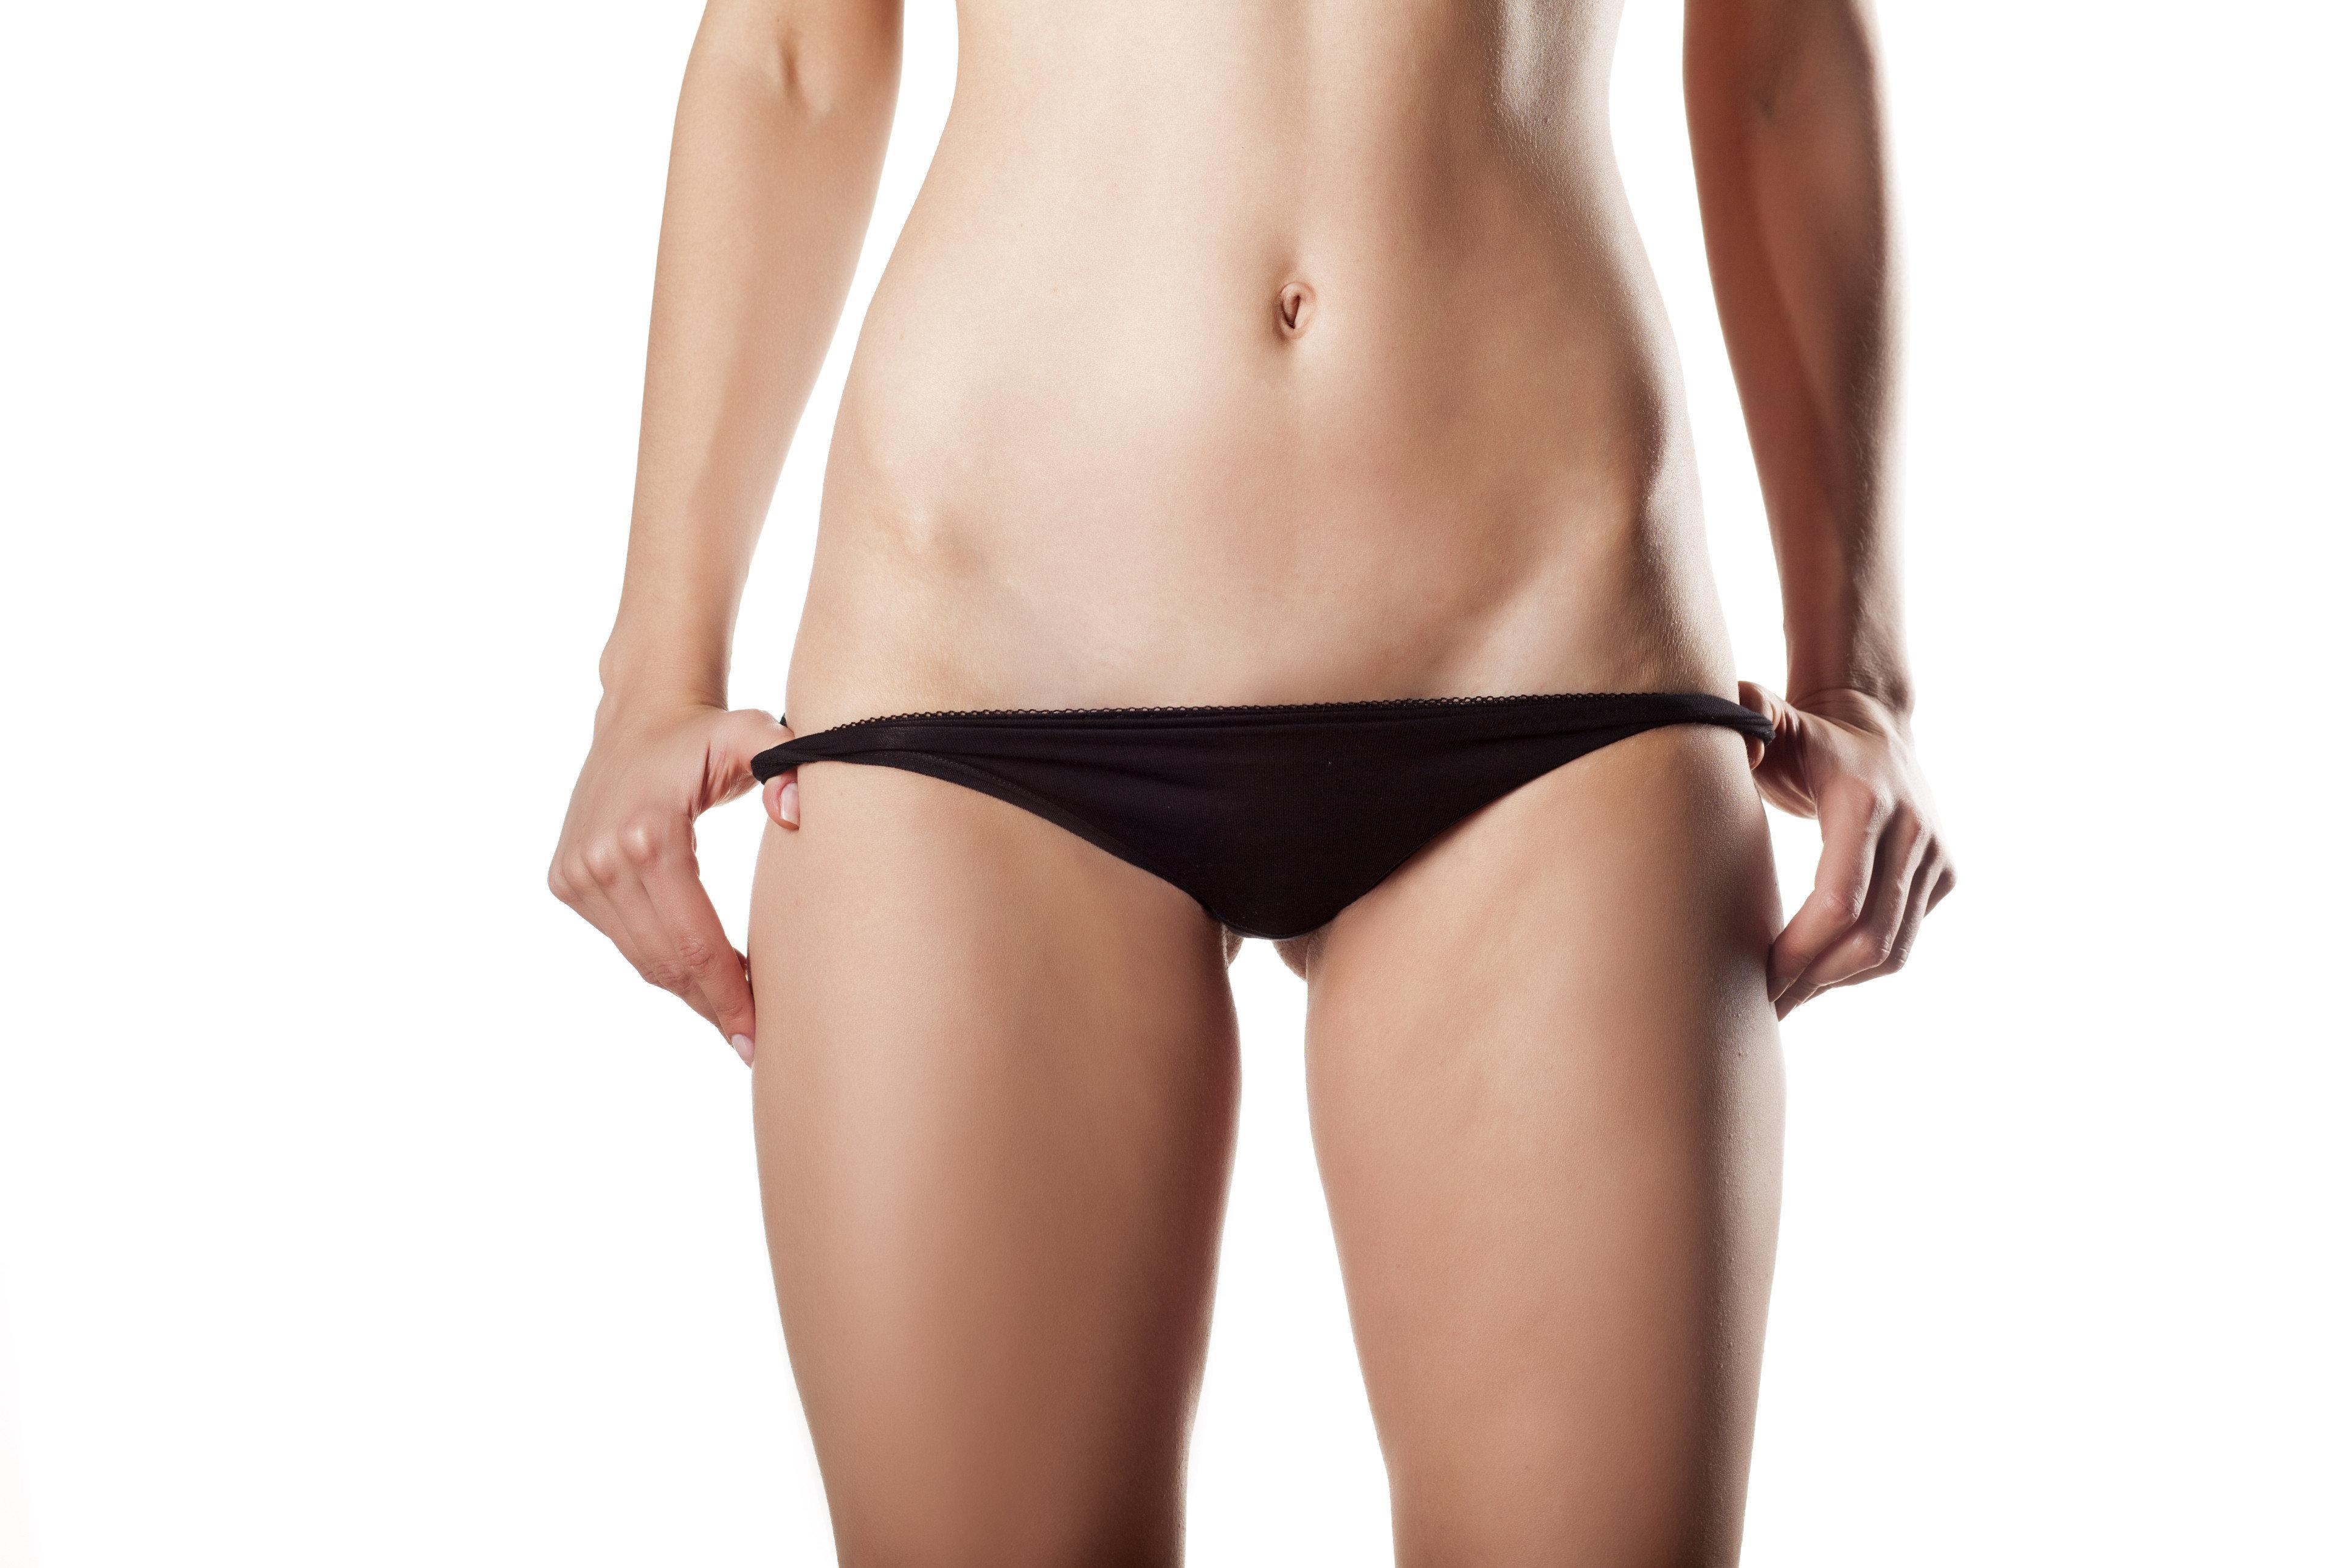 You Girl french bikini wax